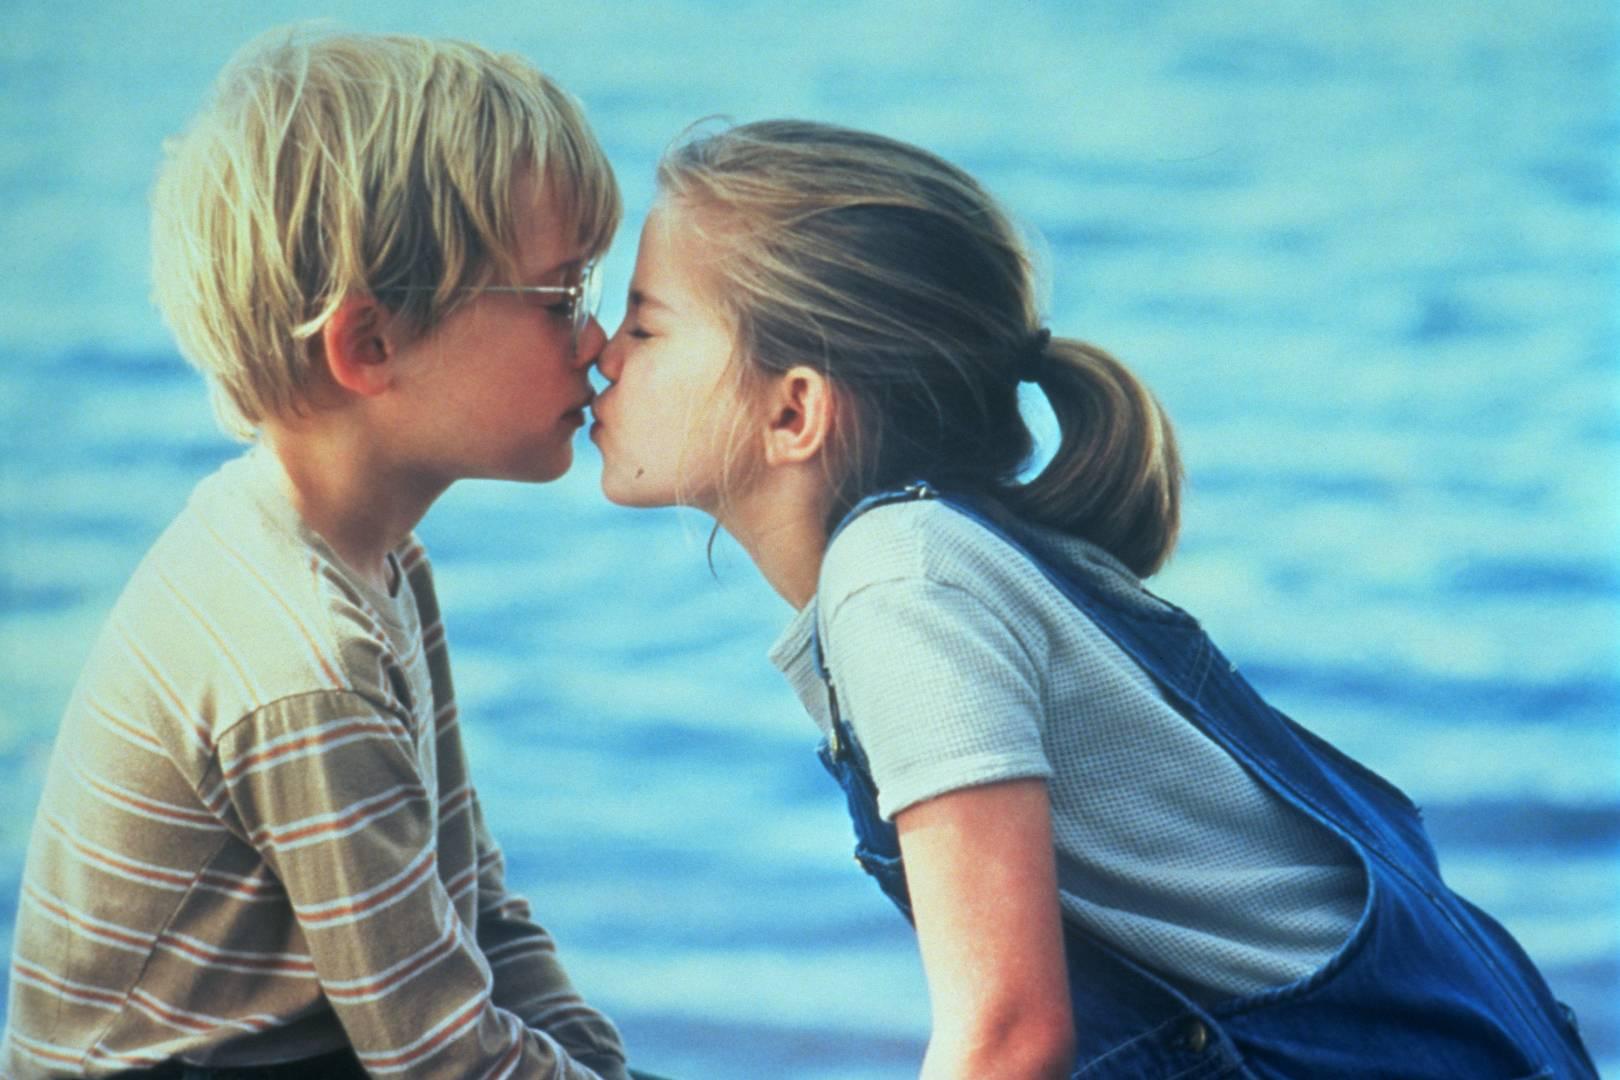 Девушки целуются (91 фото) Триникси 52